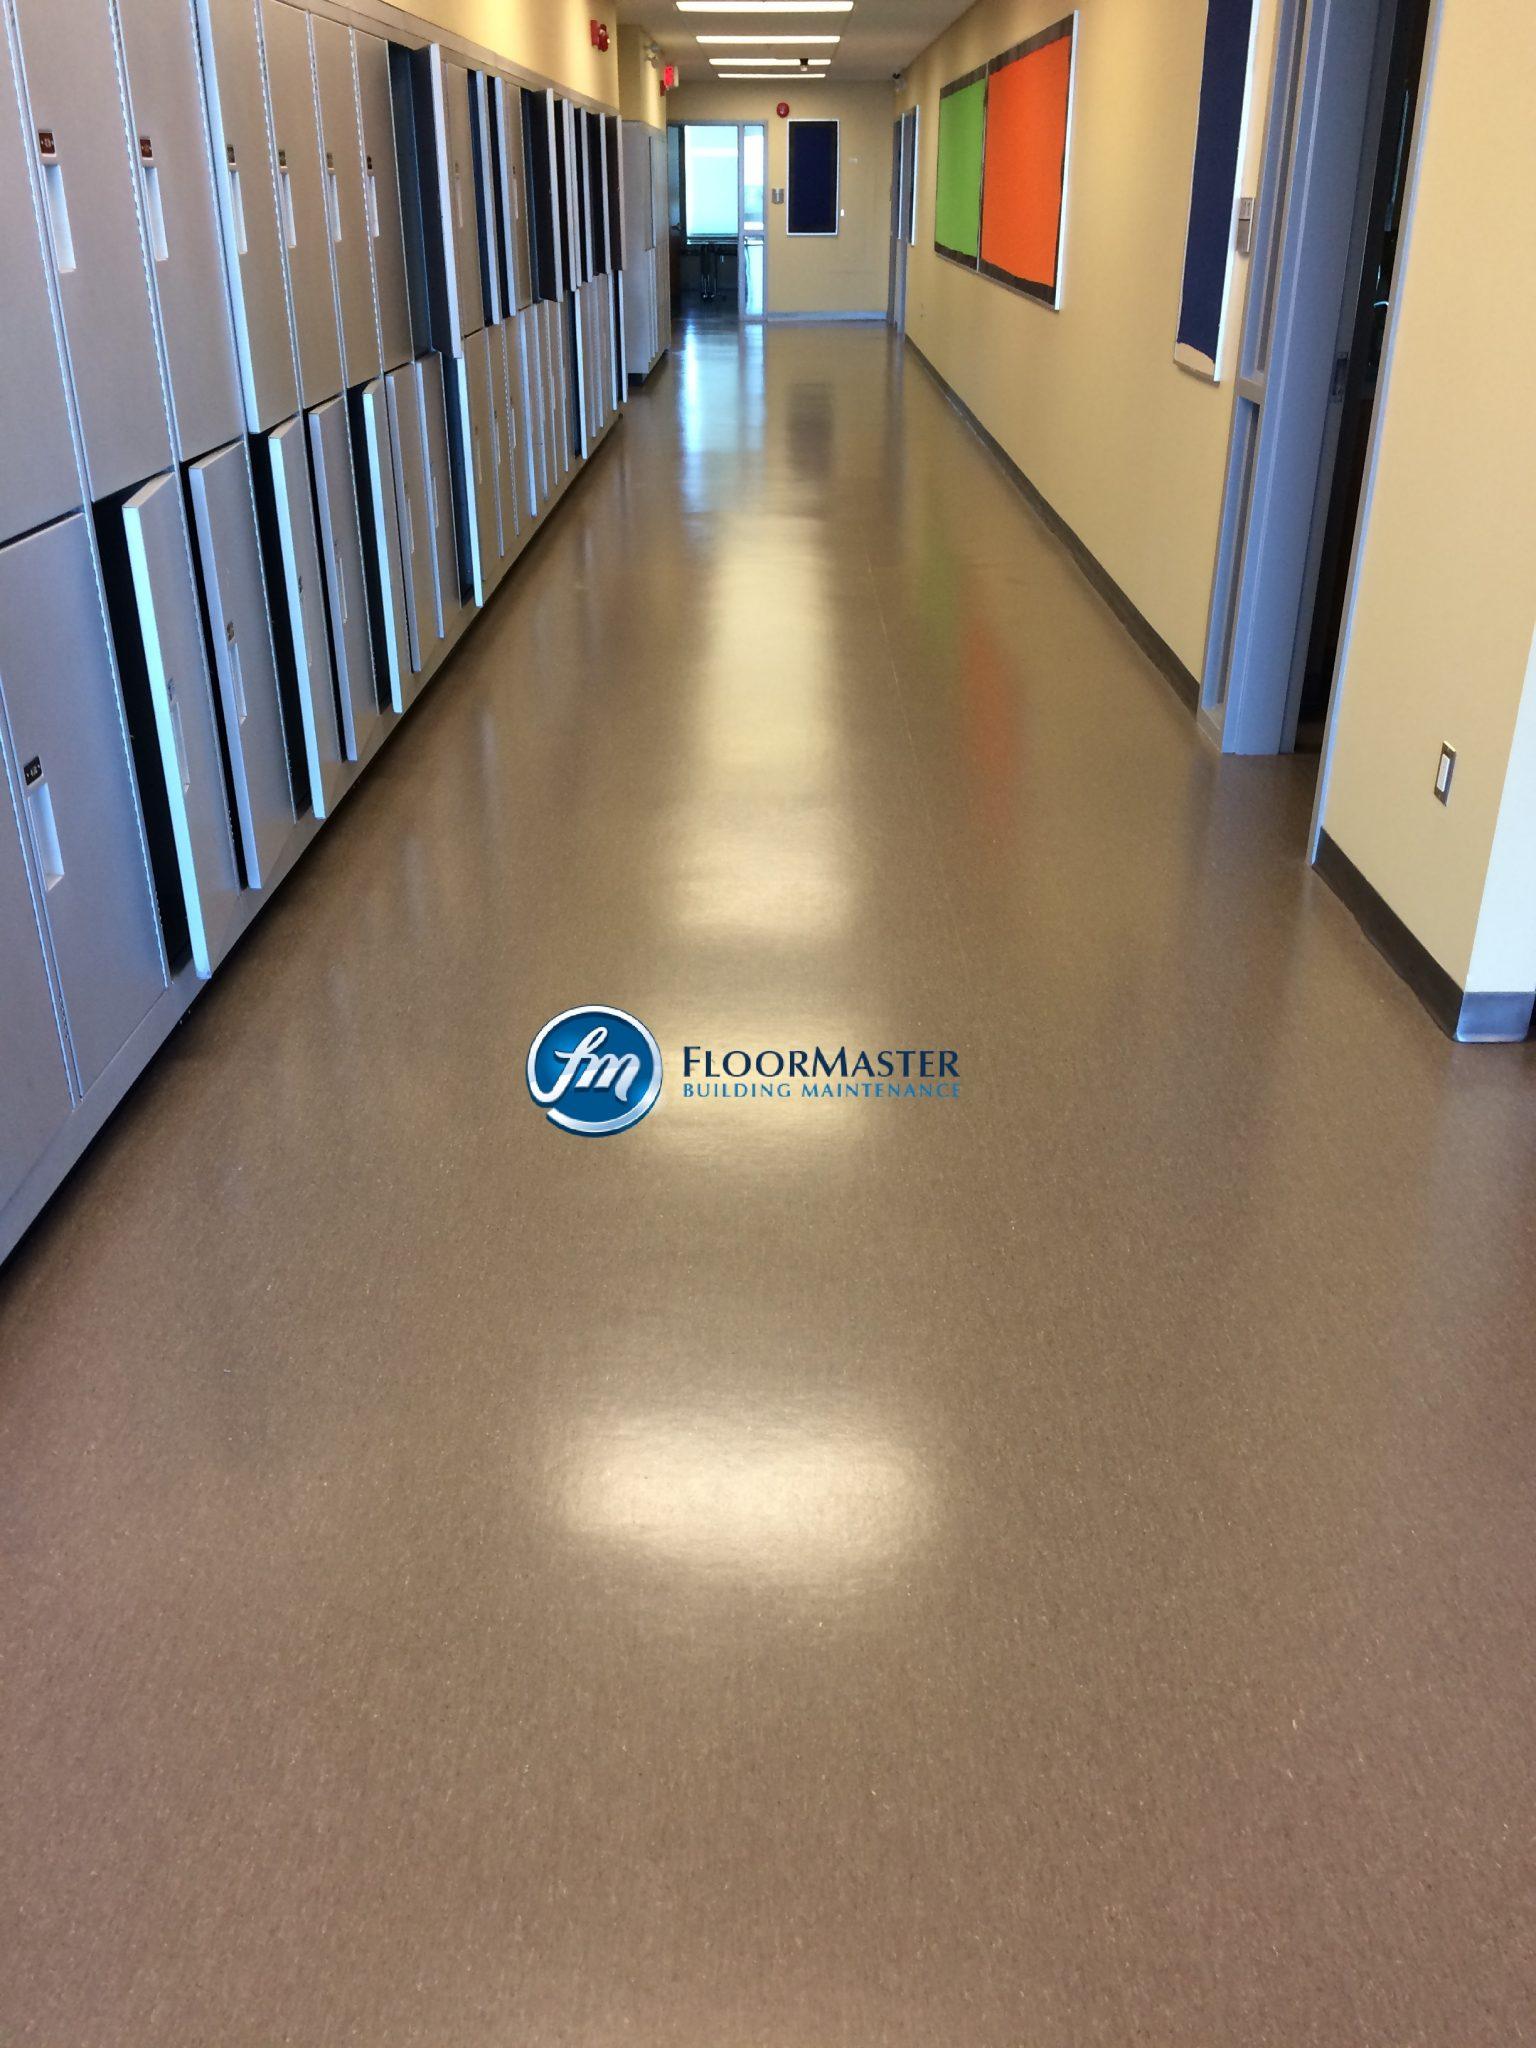 Floor Master Building Maintenance Floor Clean Company - Professional linoleum floor cleaning